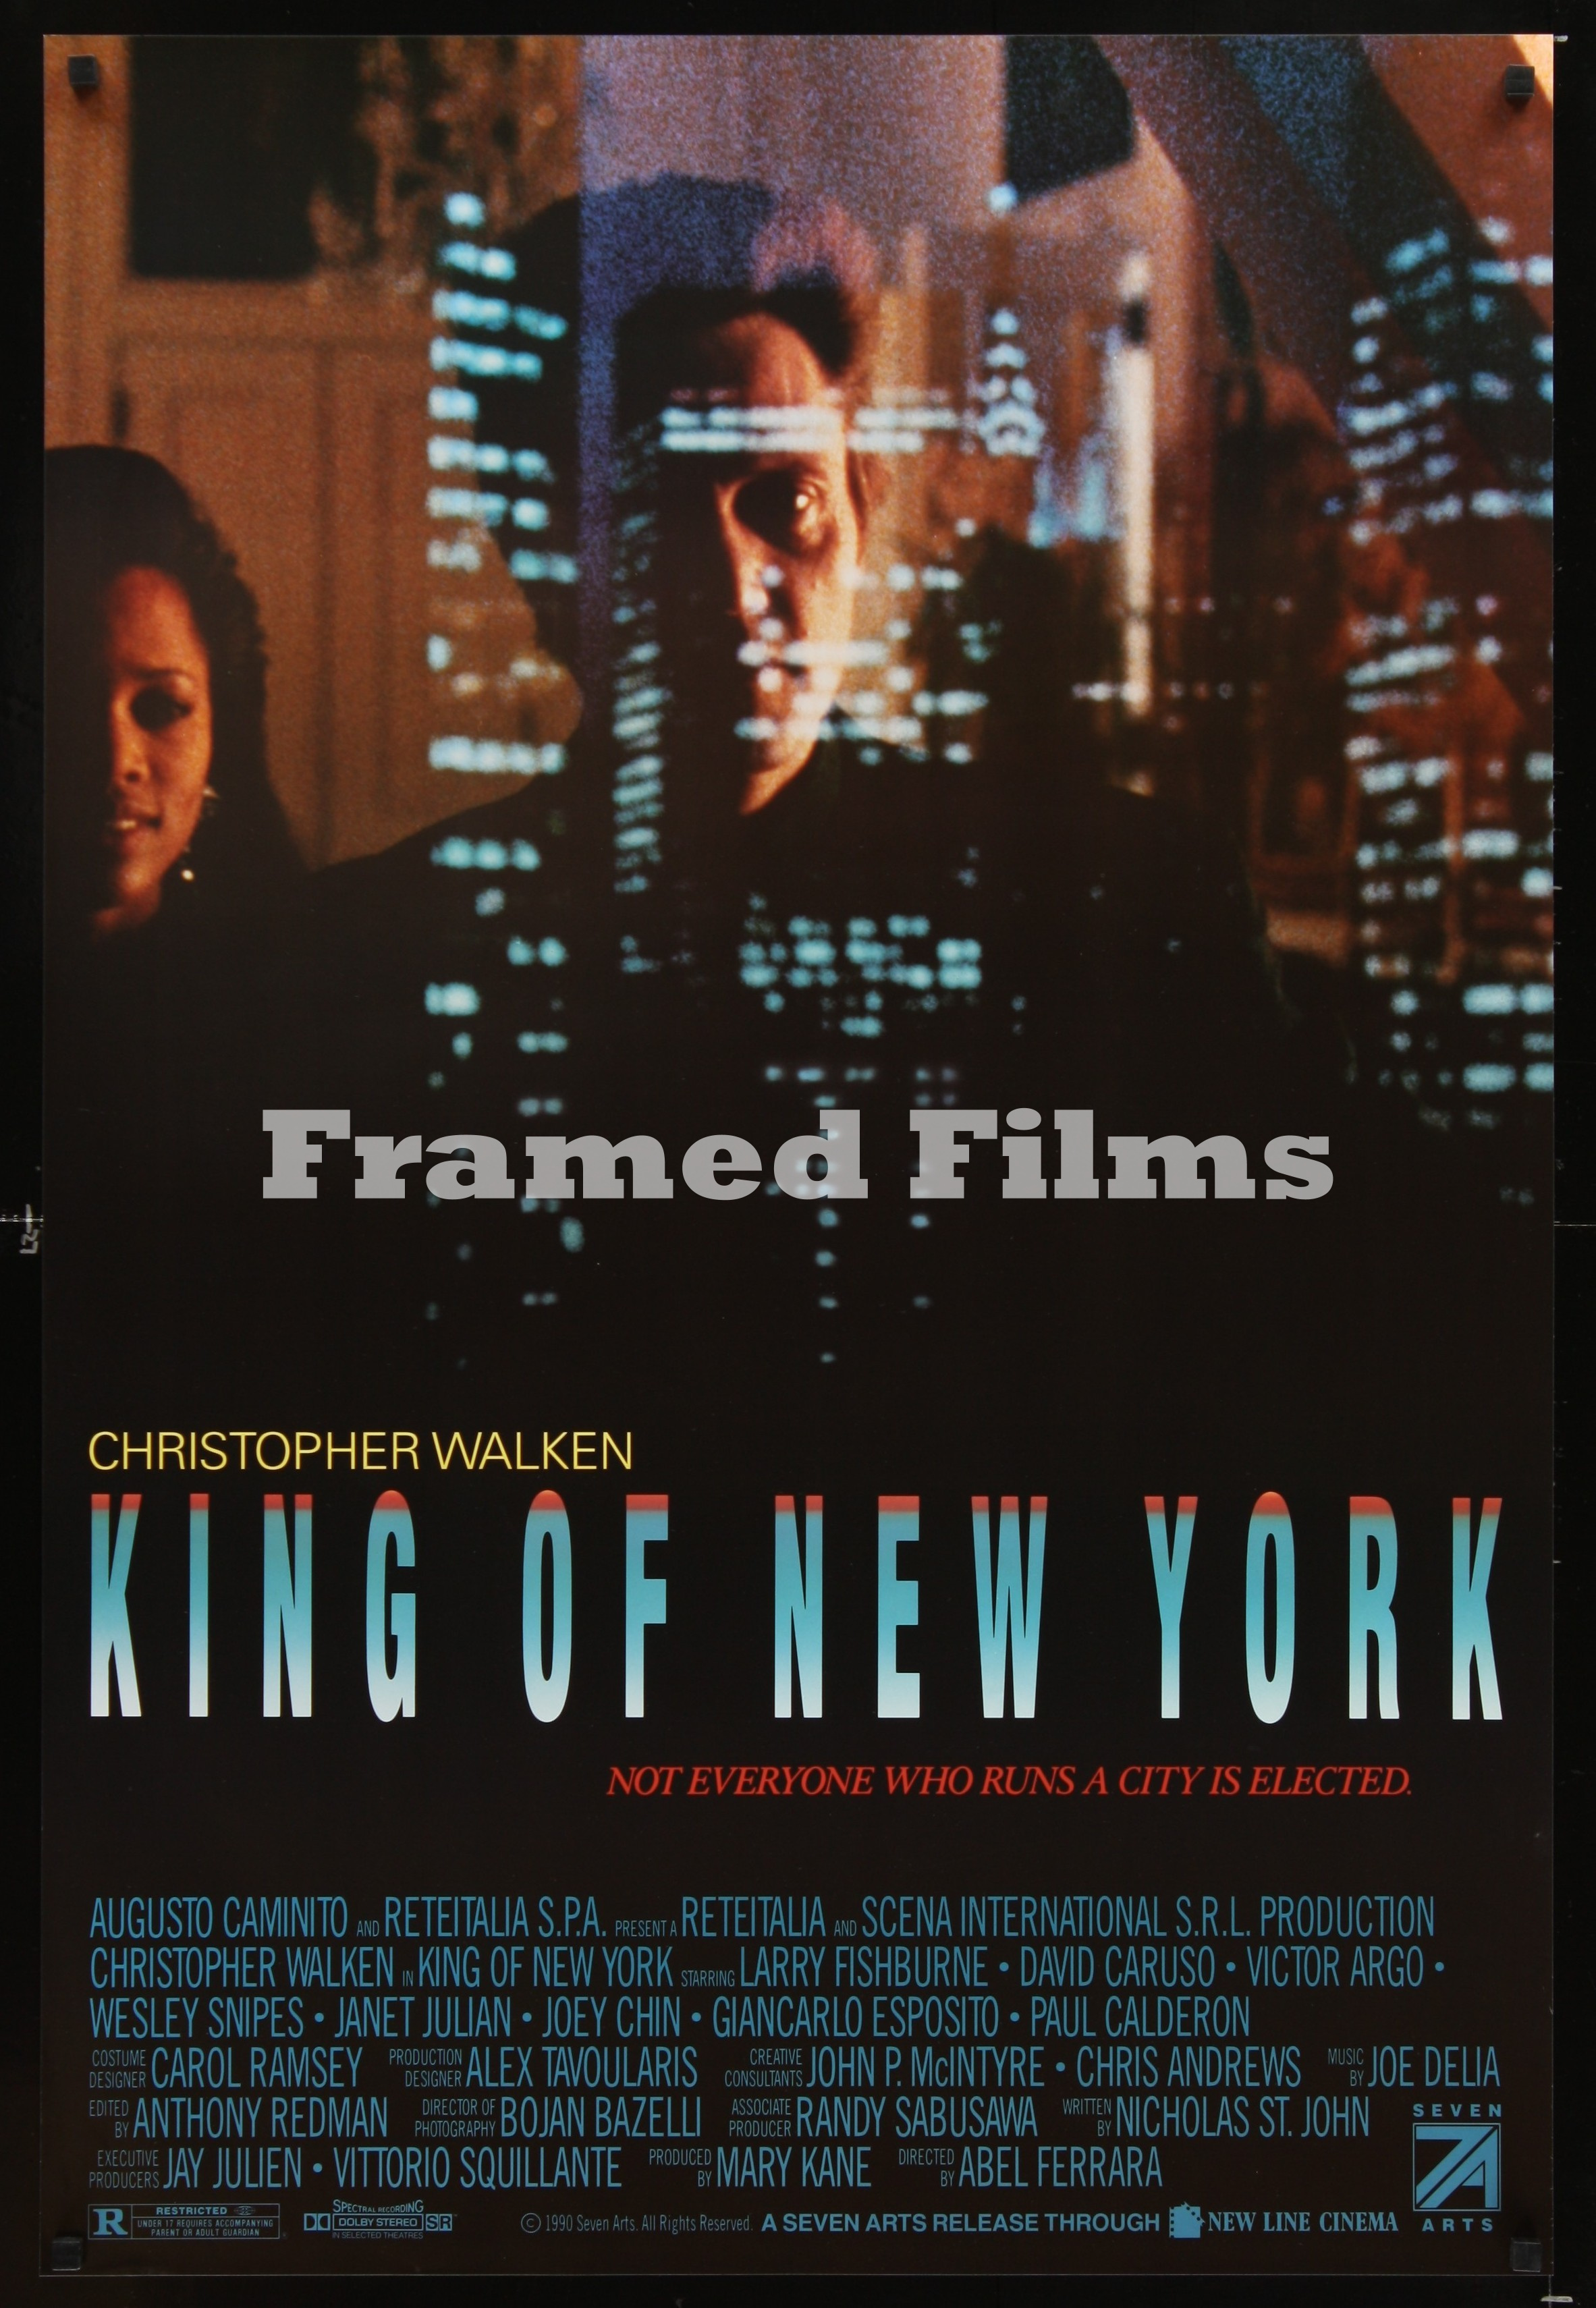 king_of_new_york_HP01650_L.jpg